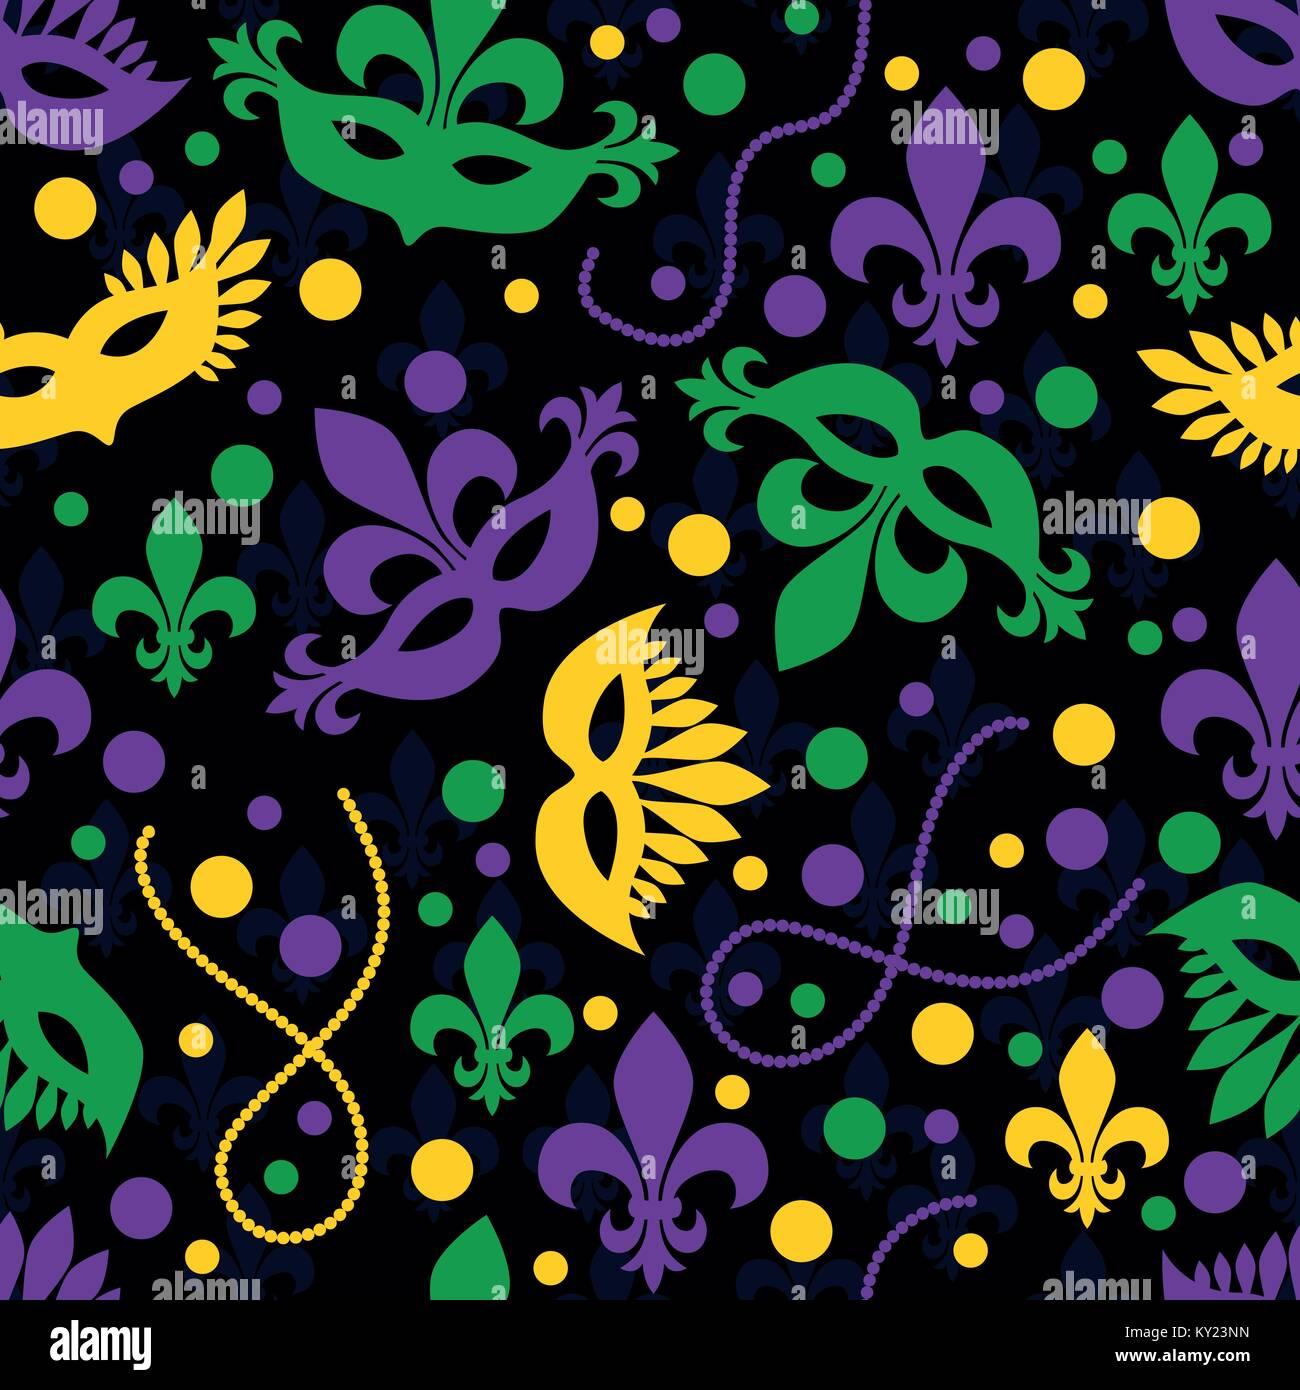 Mardi gras concept seamless pattern. Carnival masks, beads, confetti, fleur de lis. Shrove Tuesday, Fat Tuesday - Stock Vector